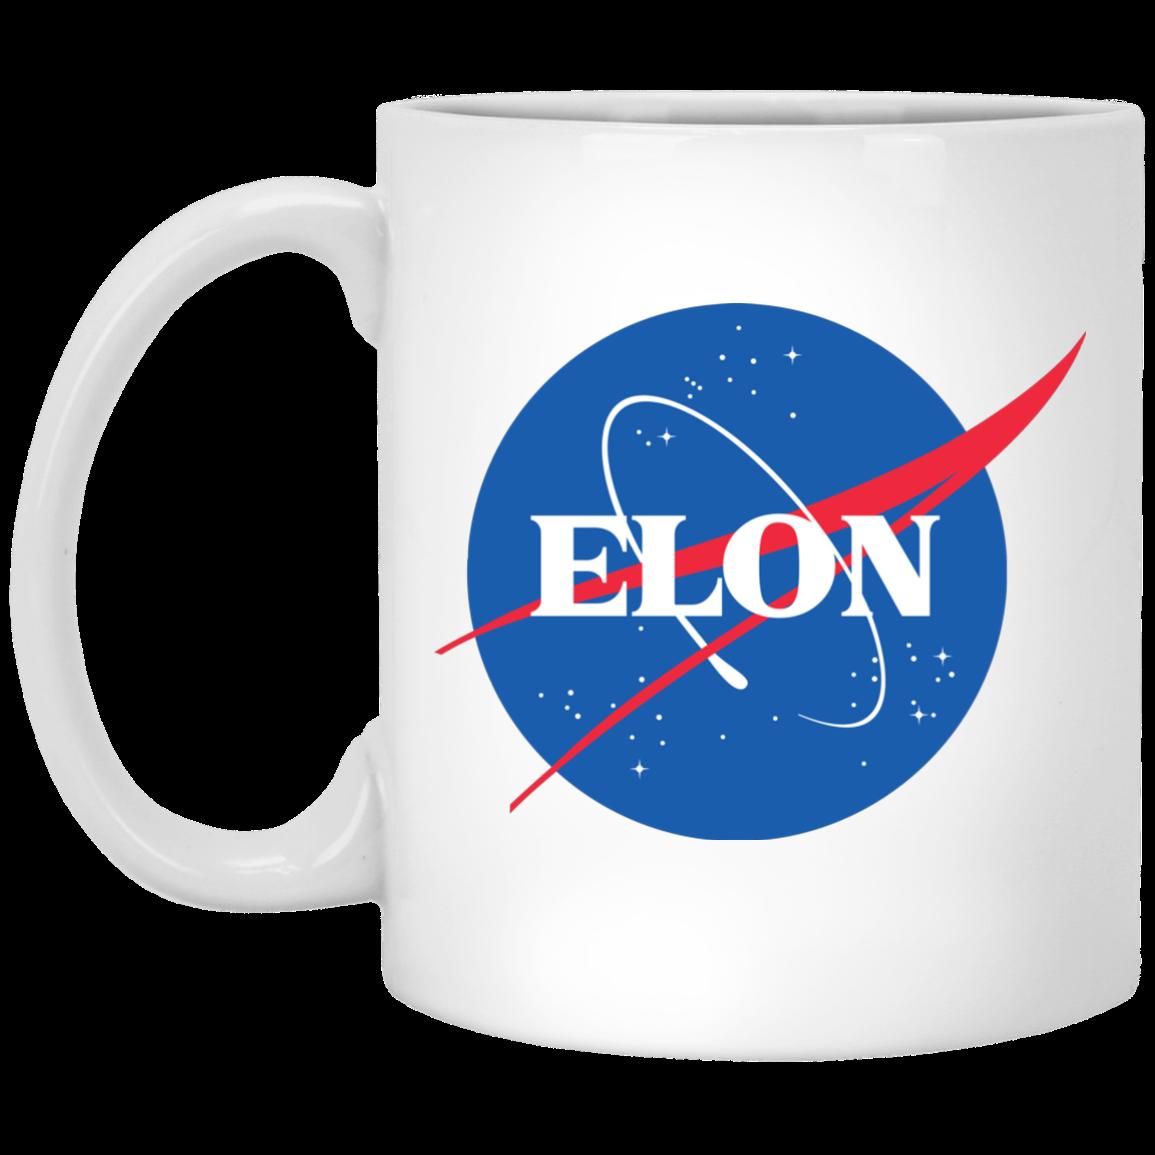 imagepx Elon Nasa parody coffee mug